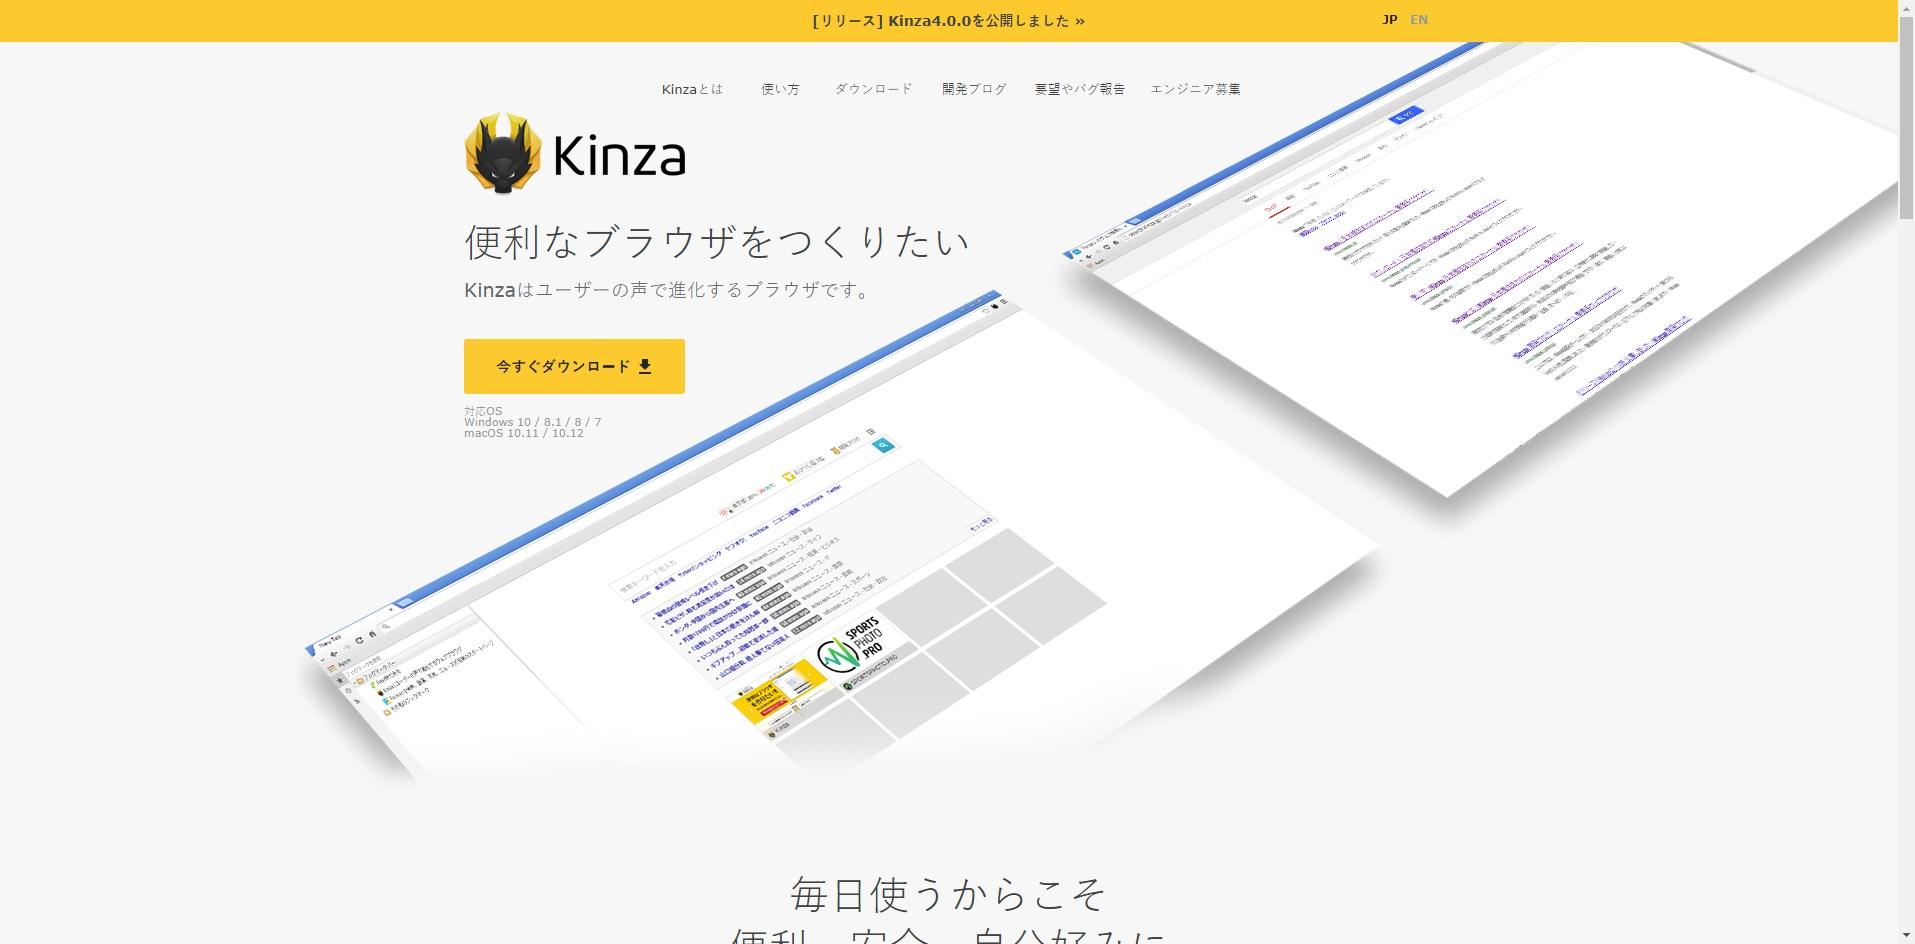 Kinzaダウンロード画面